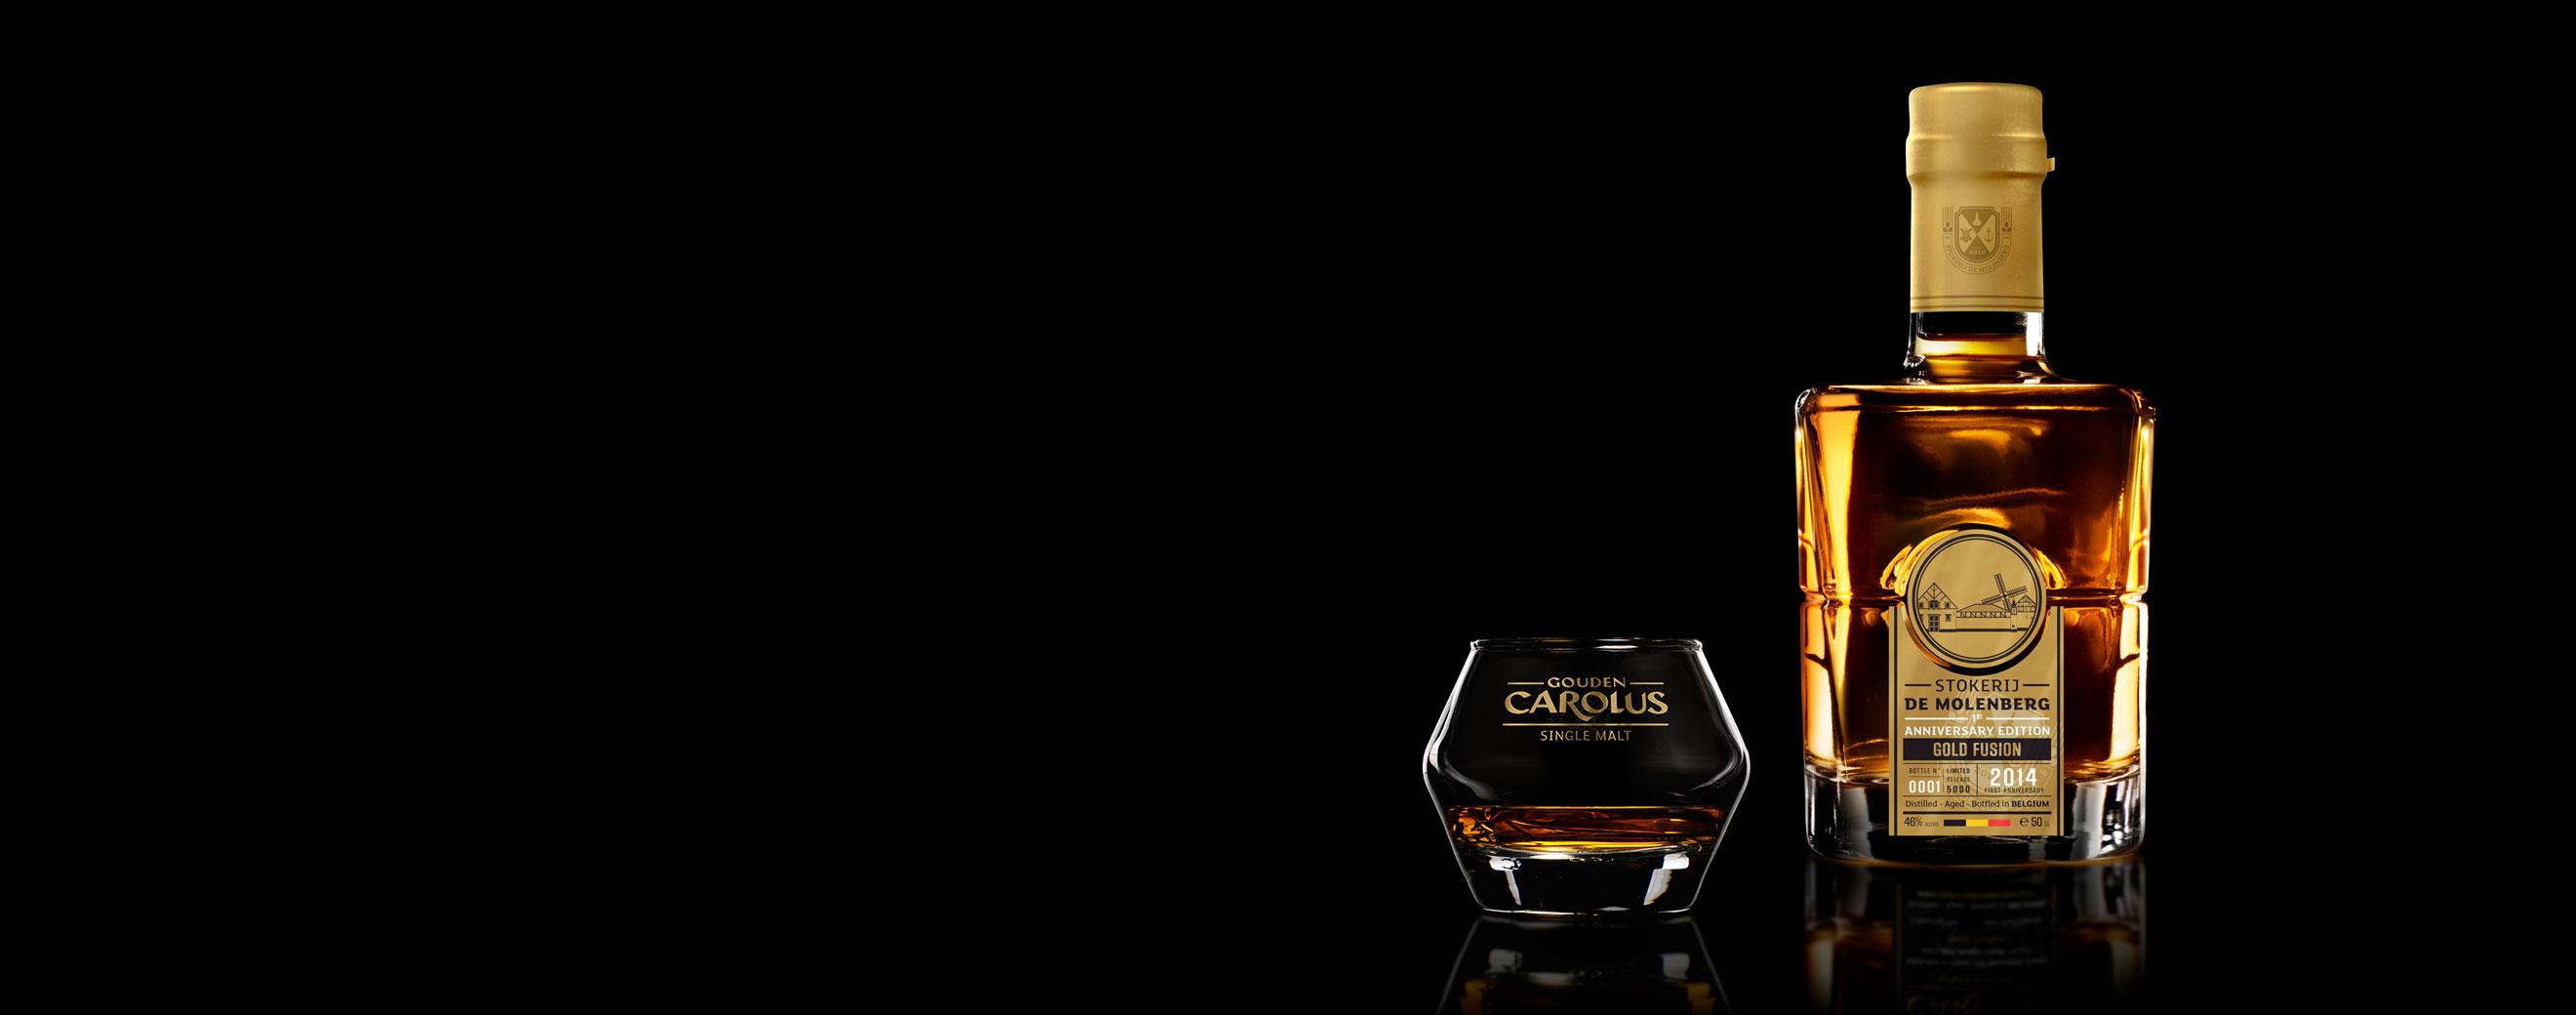 Gold Fusion 2014 Whisky Stokerij De Molenberg